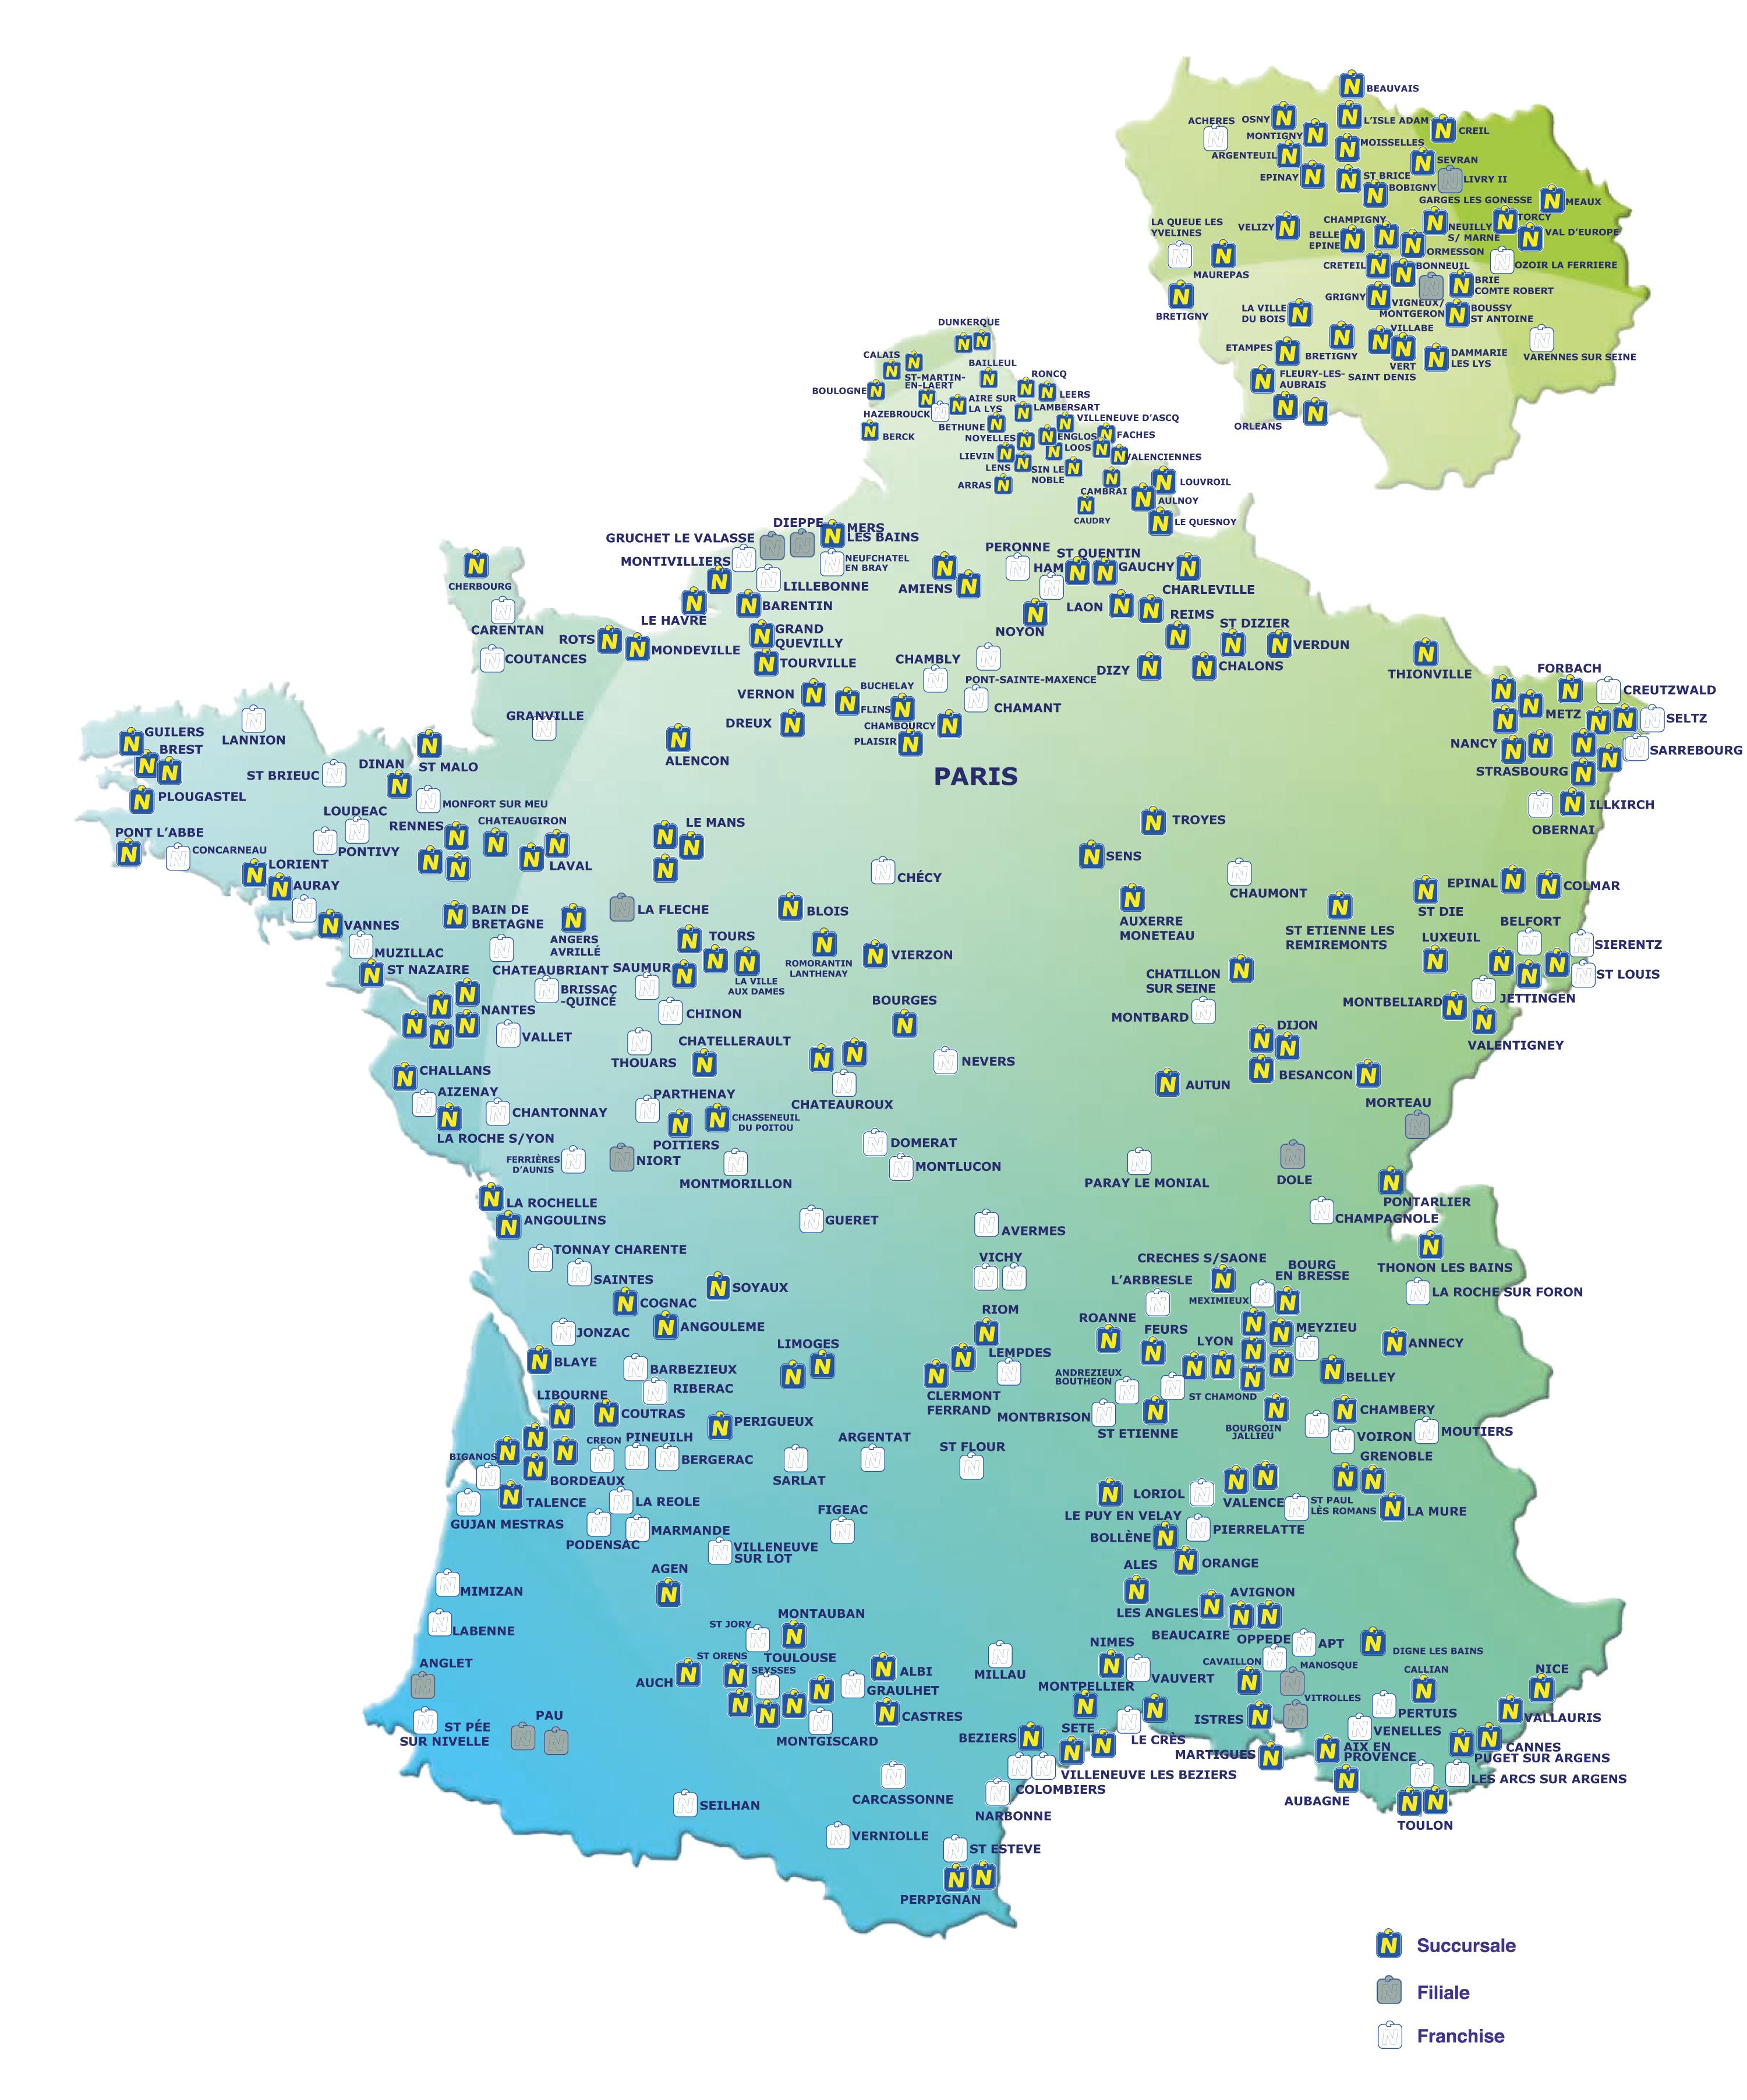 Carte de France des enseignes Norauto